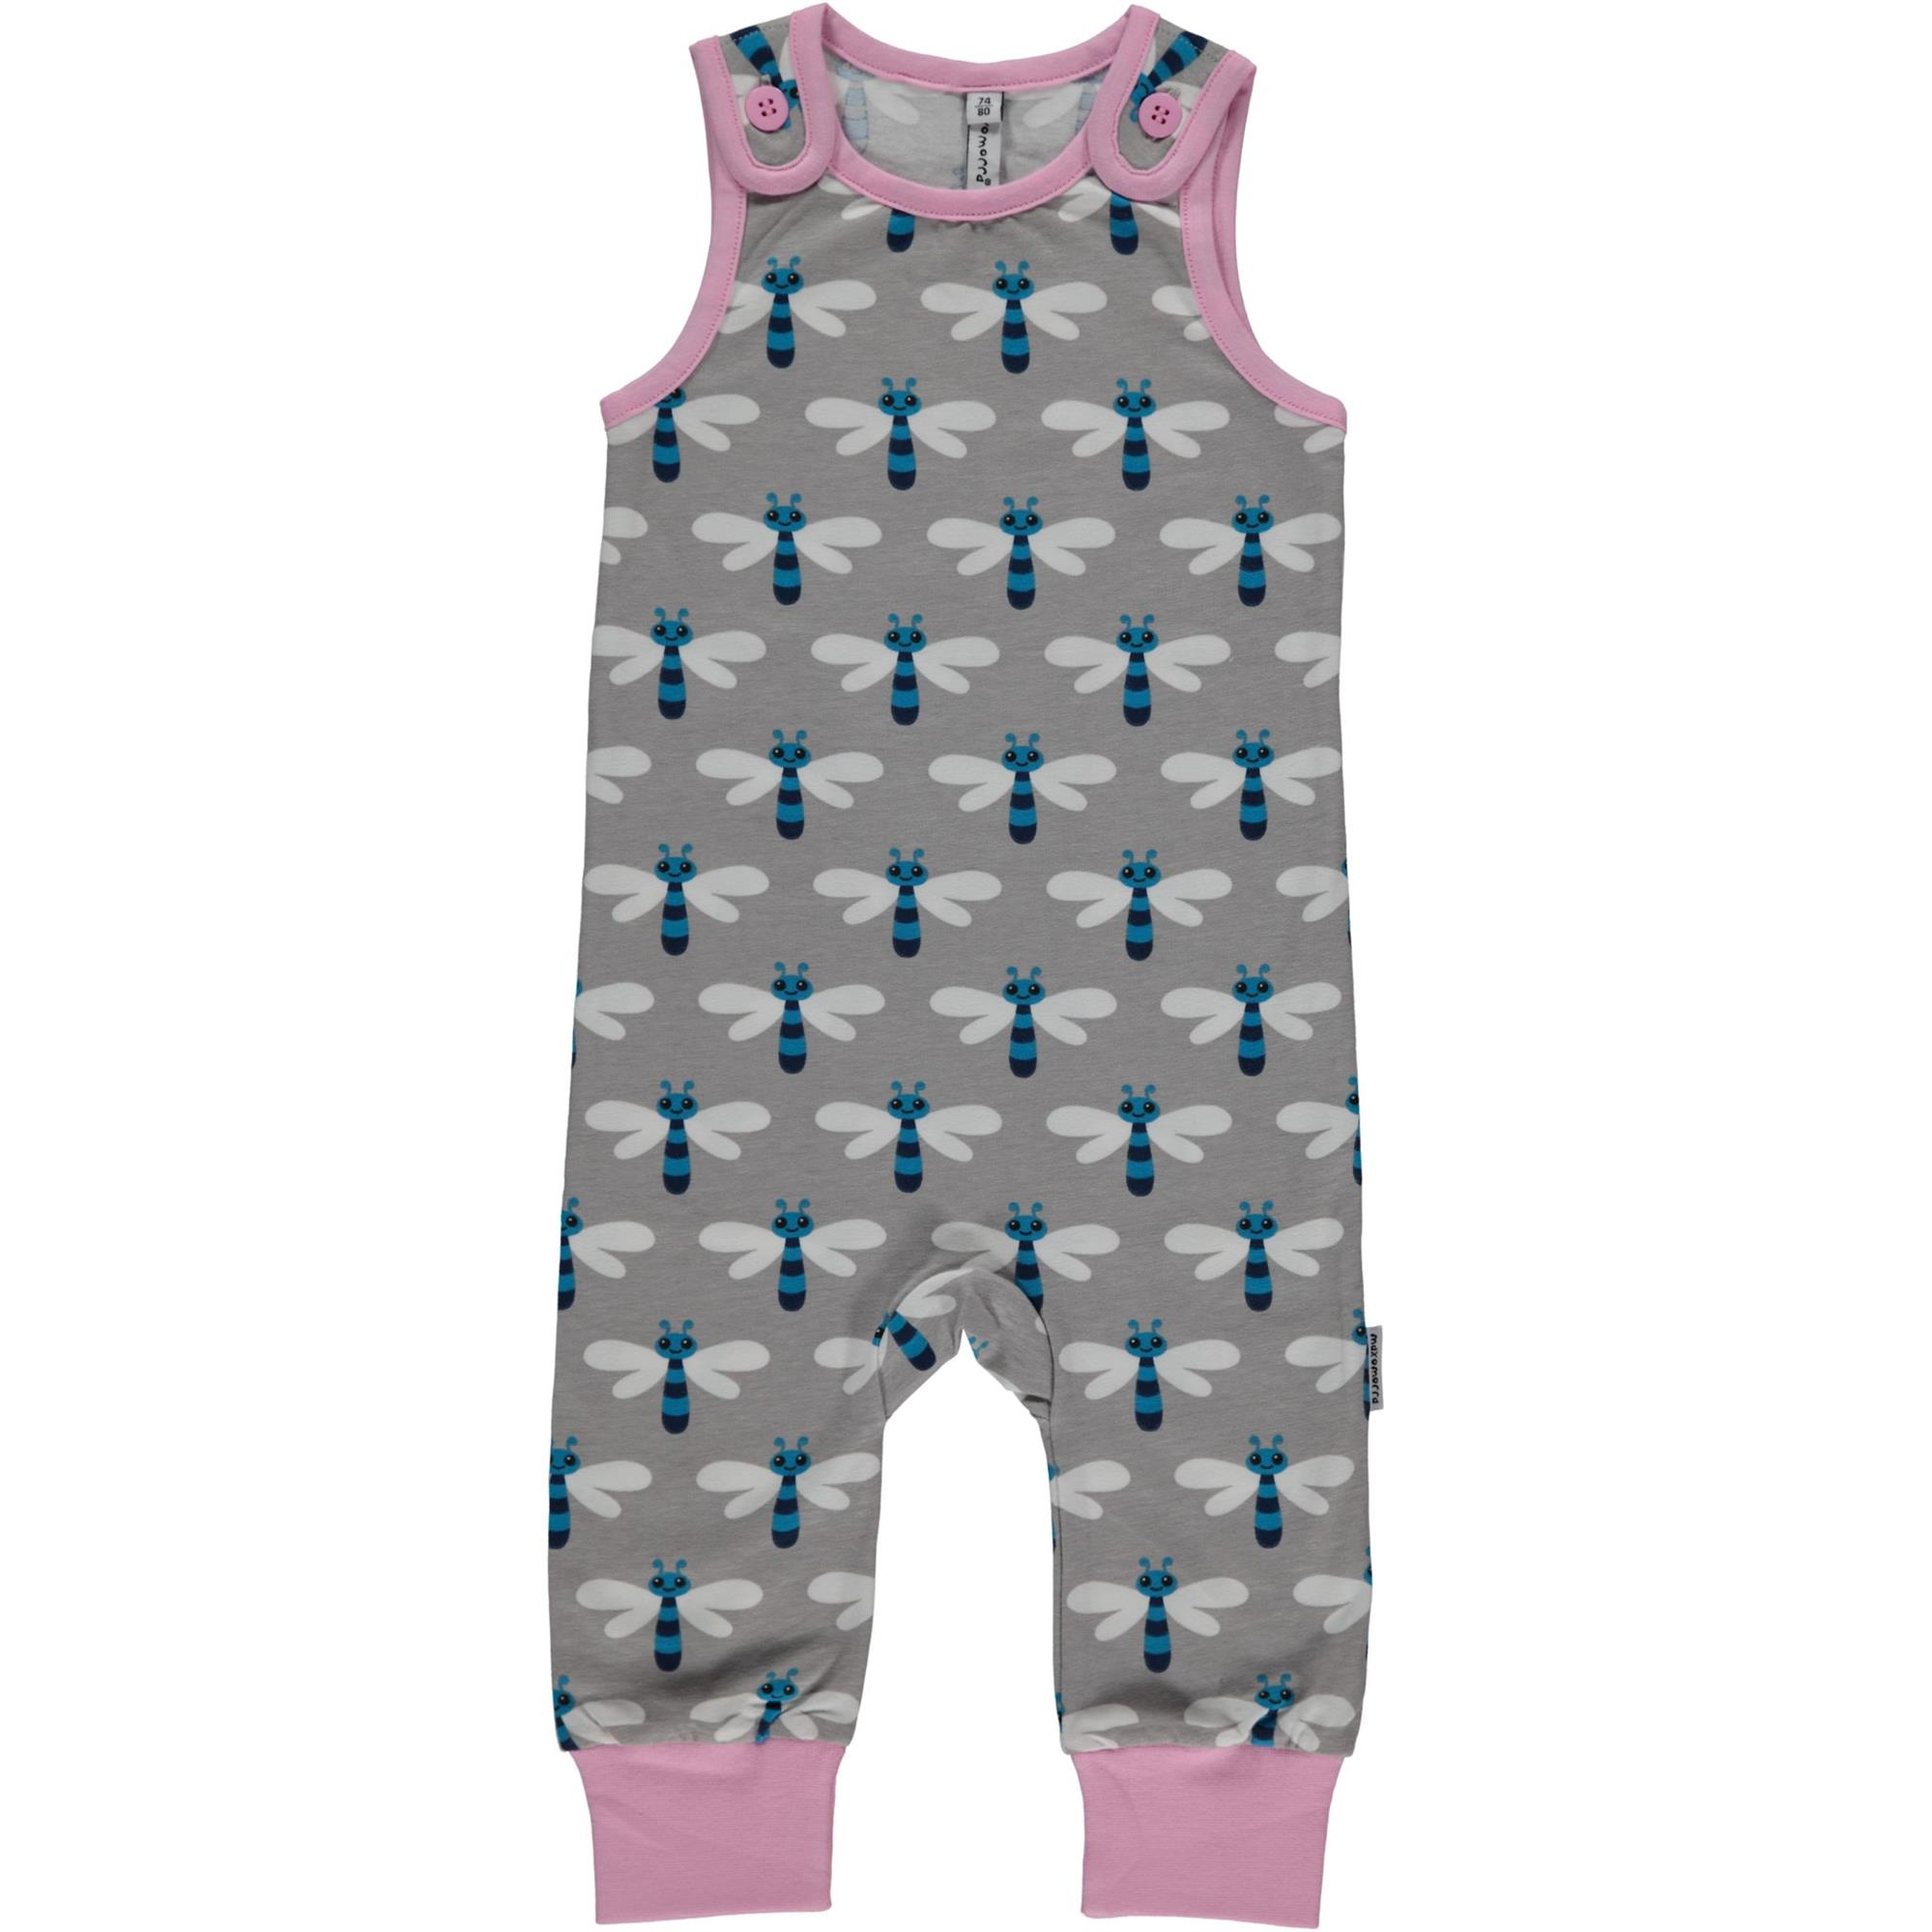 7ea5332db1f74 Maxomorra Dragonfly Organic Cotton Playsuit - Catfish Kids